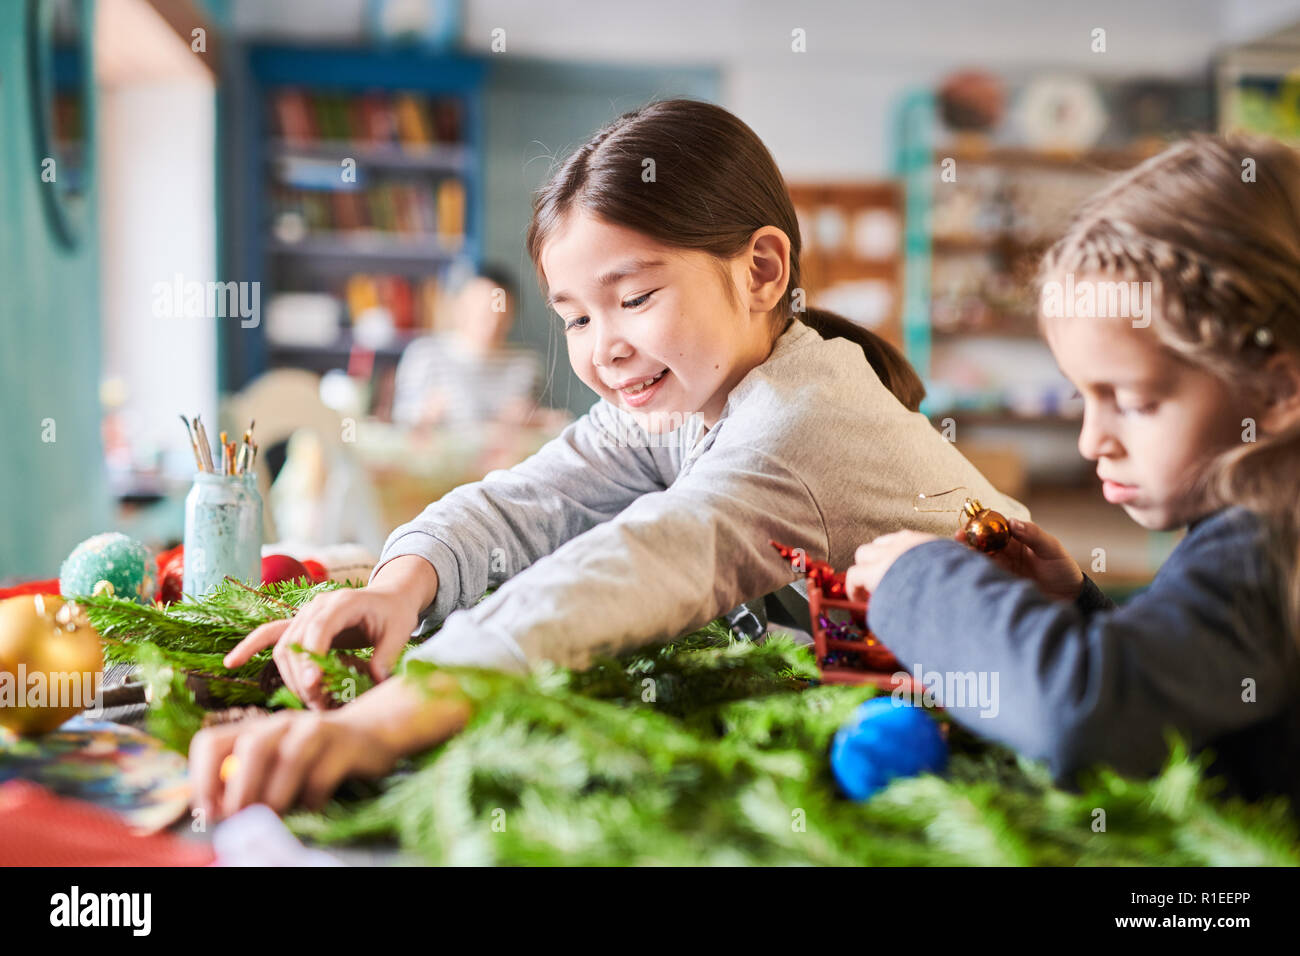 Children Making Christmas Decorations Stockfotos & Children Making ...